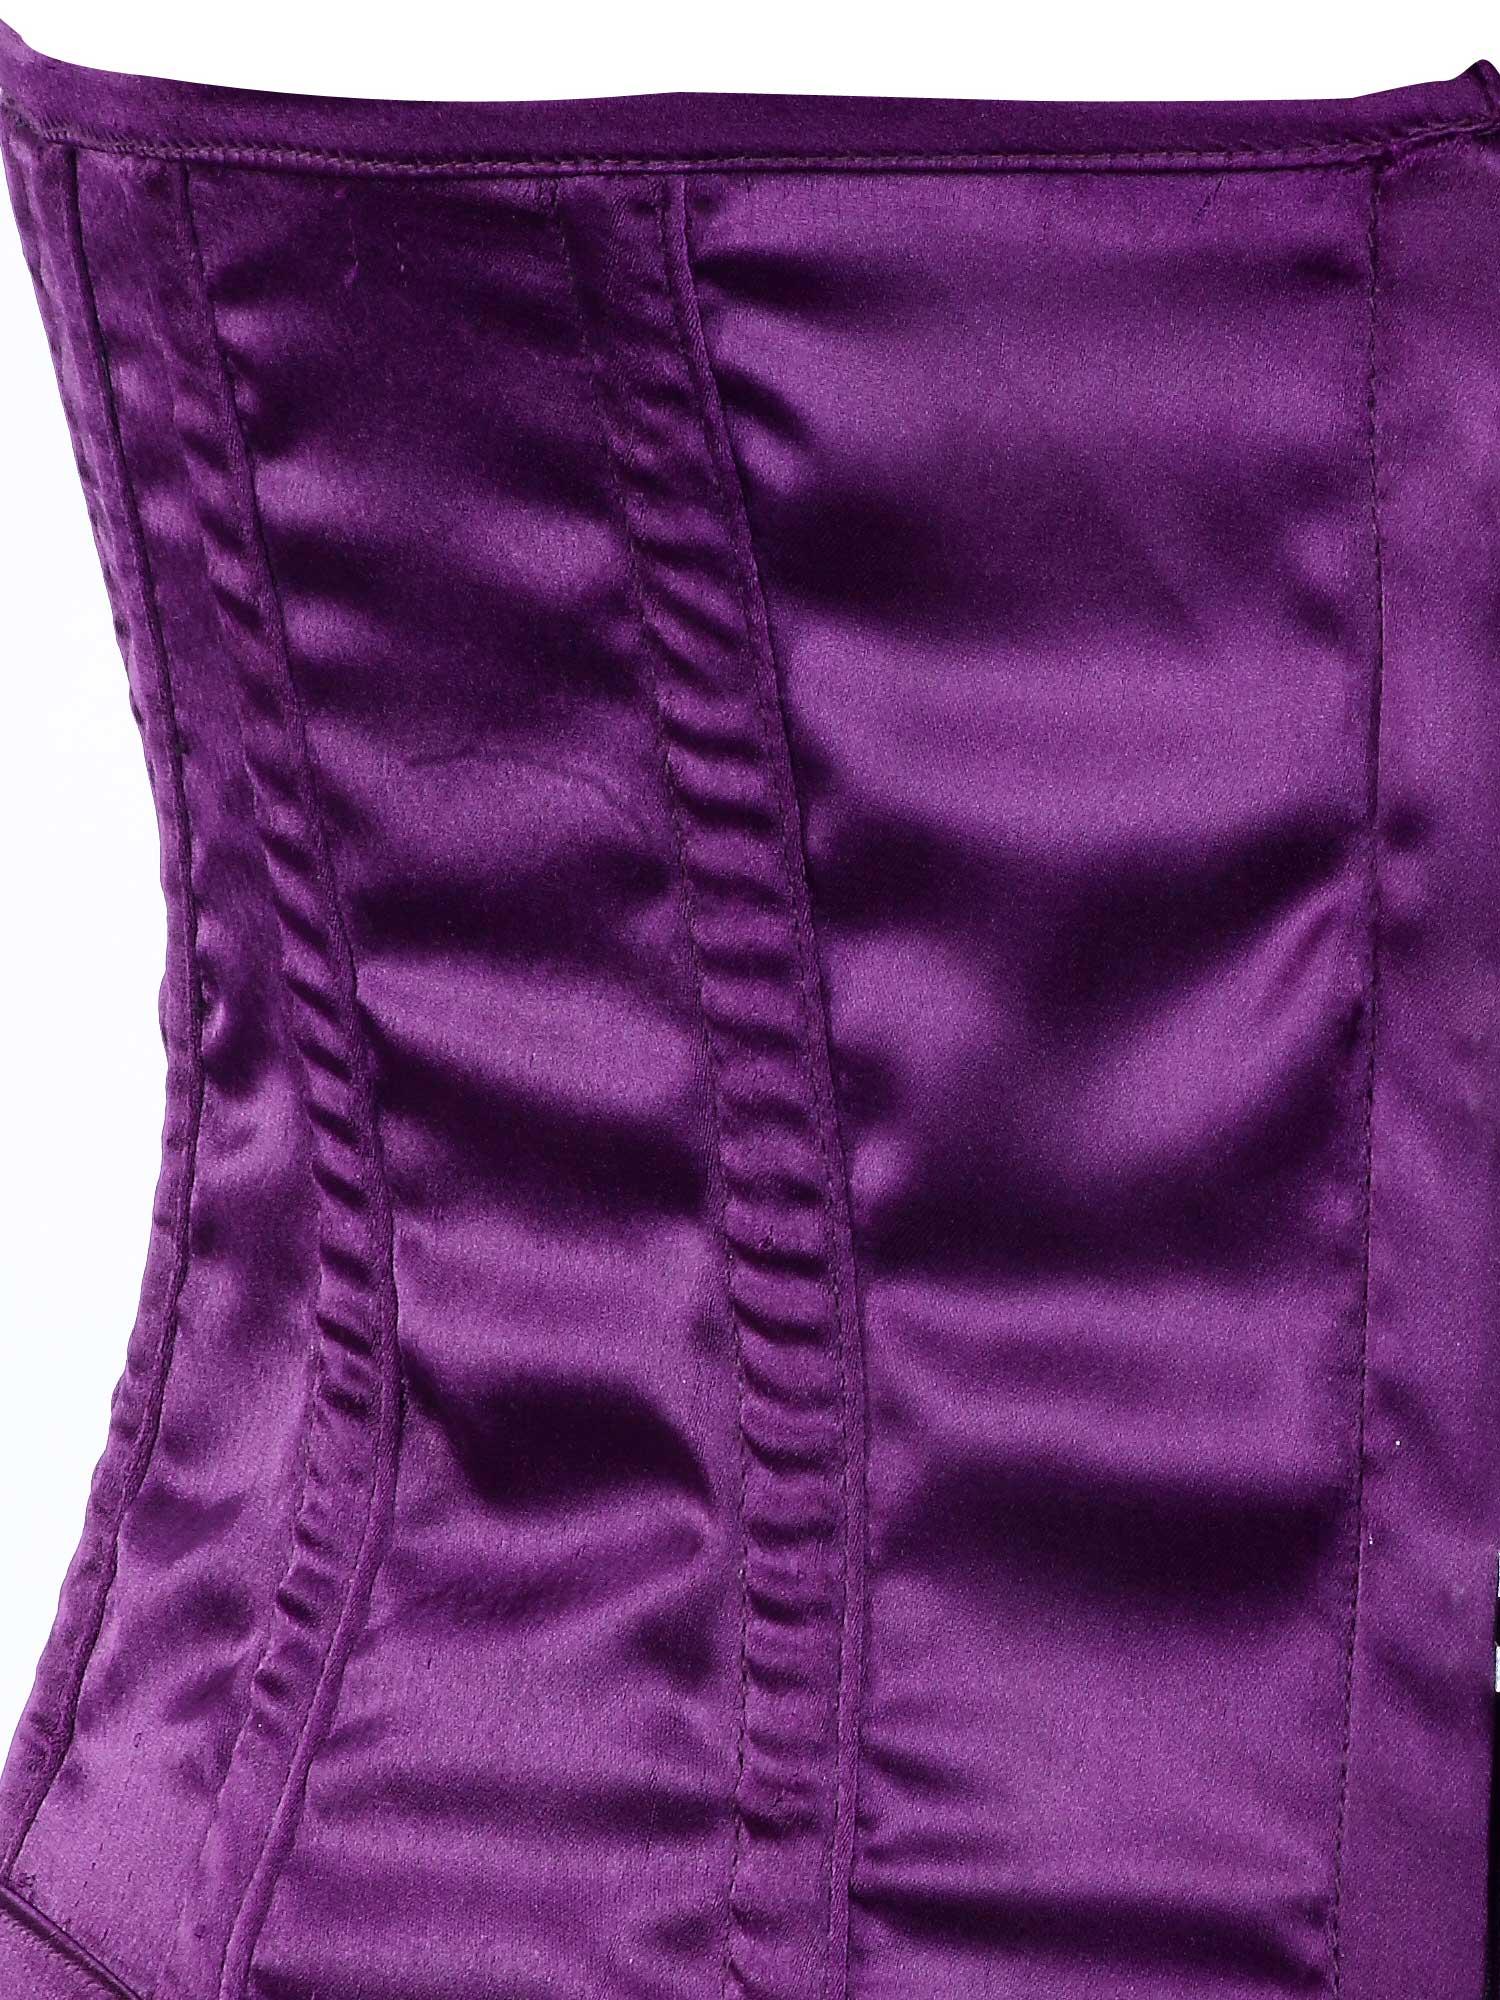 purple_satin_fabric_steel_boning_underbust_corset_waist_cincher_bustier_bustiers_and_corsets_2.jpg